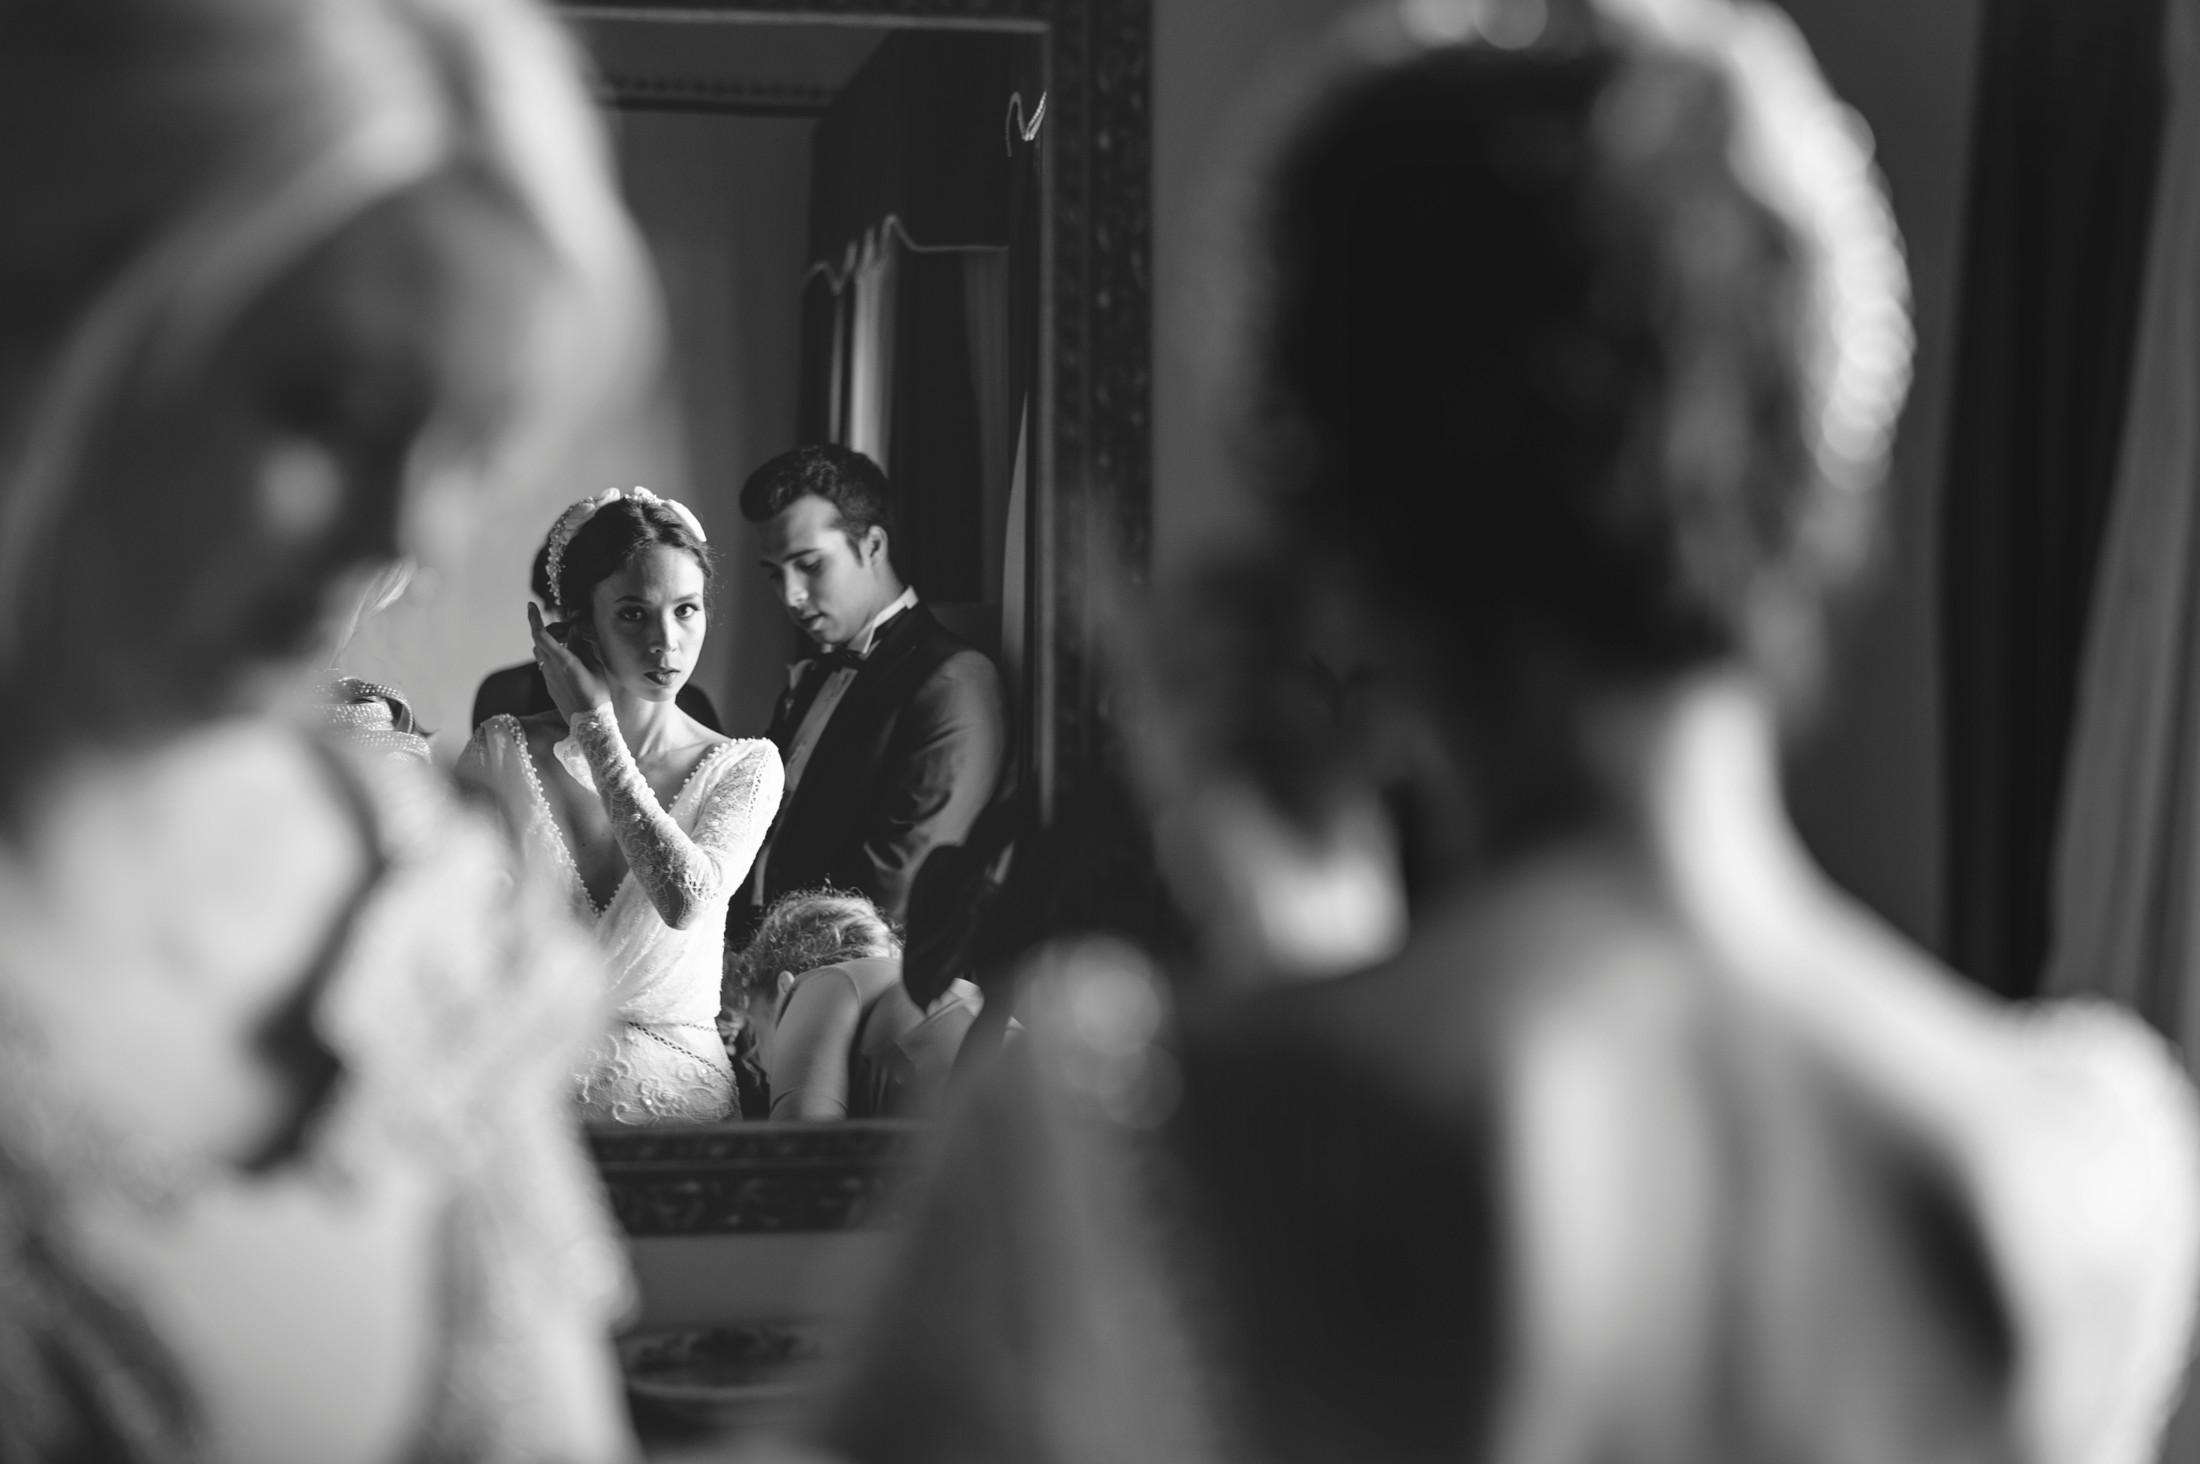 luxury wedding briee during the preparation